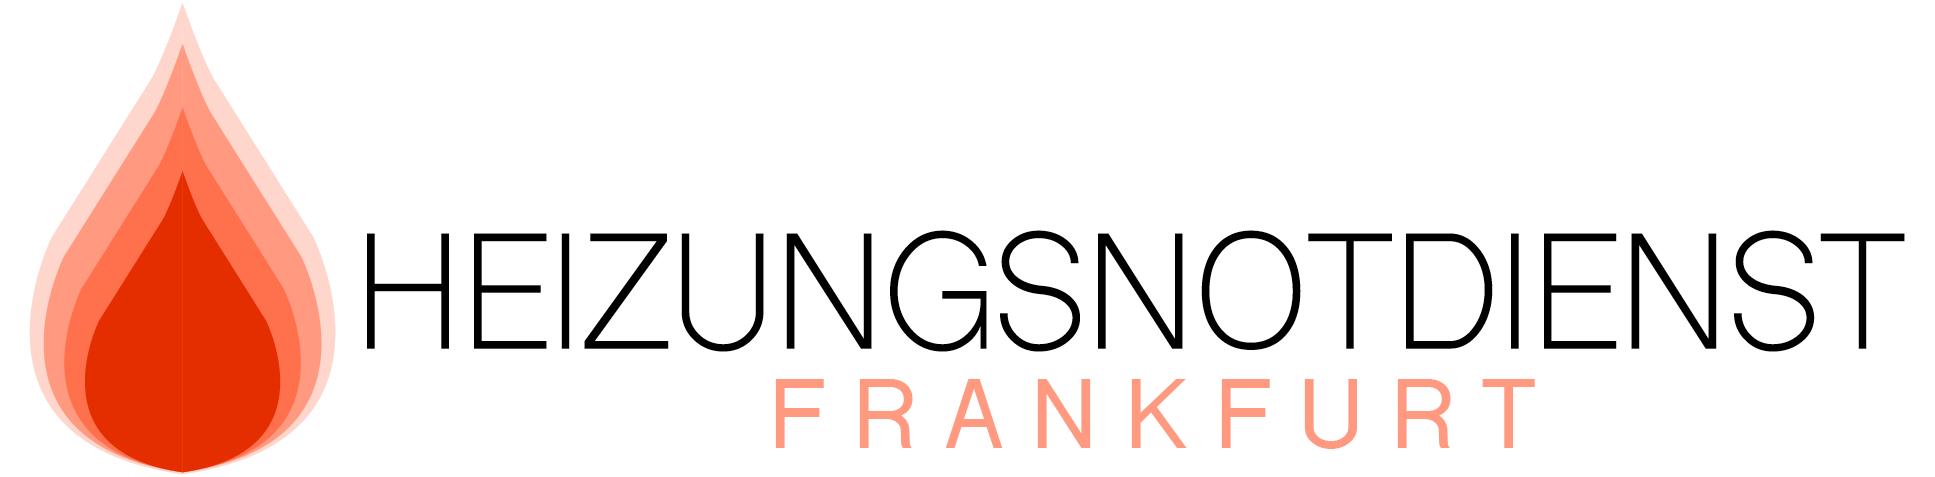 Logo_Rechteck_Frankfurt_Heizung_Notdienst.png